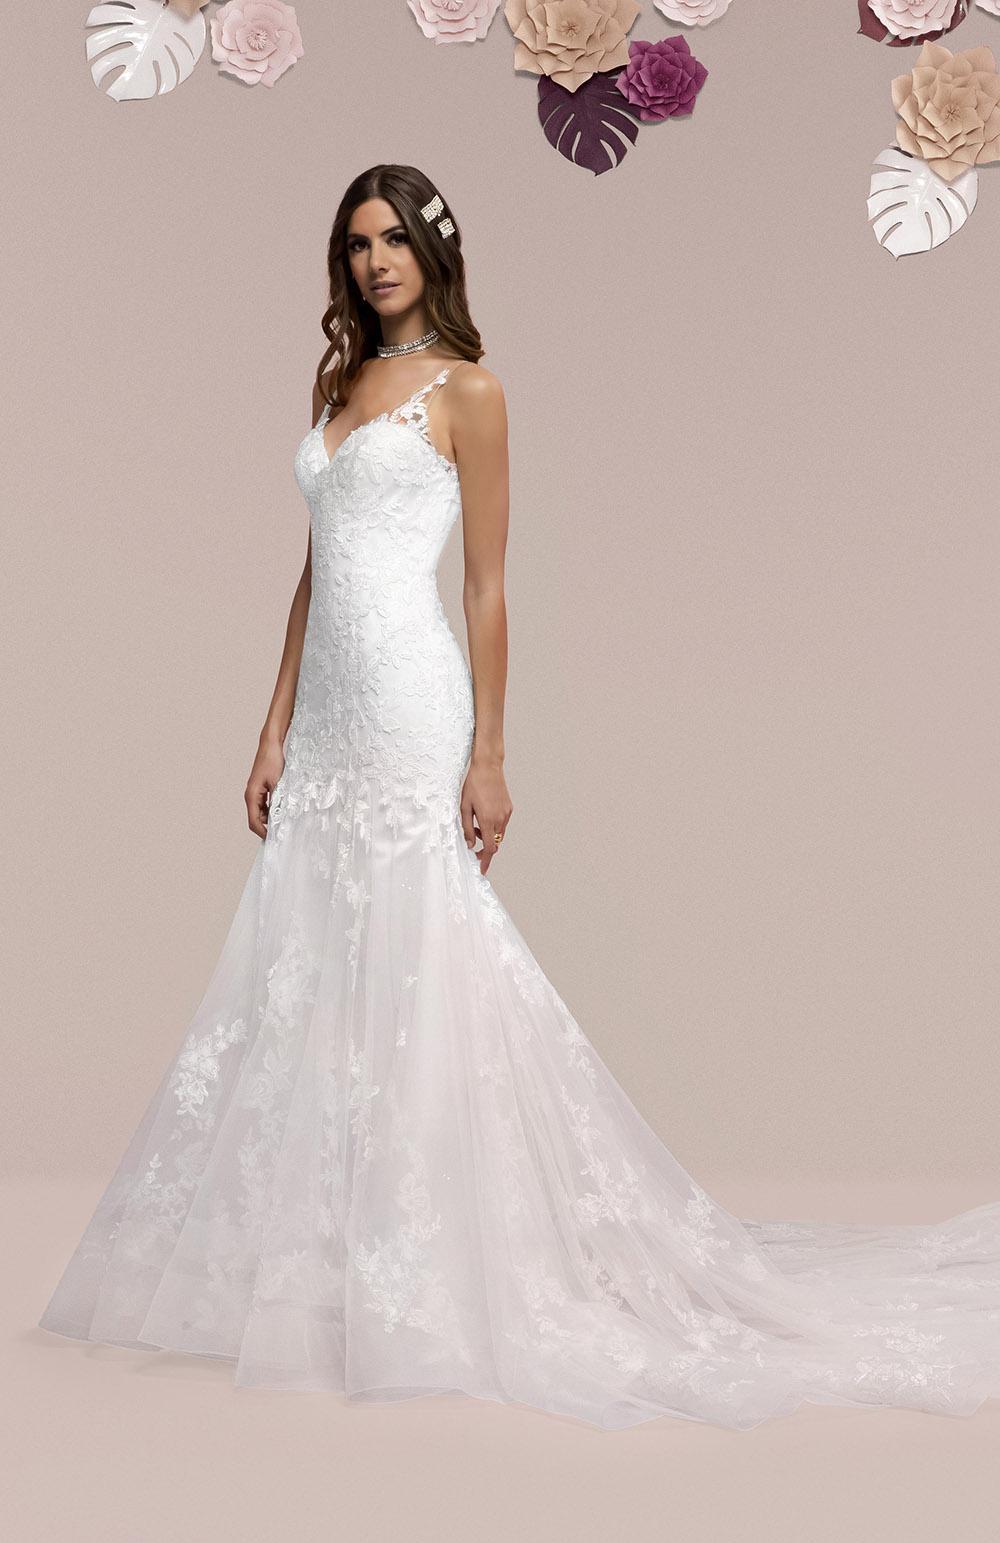 Robe de mariée Modèle Veca